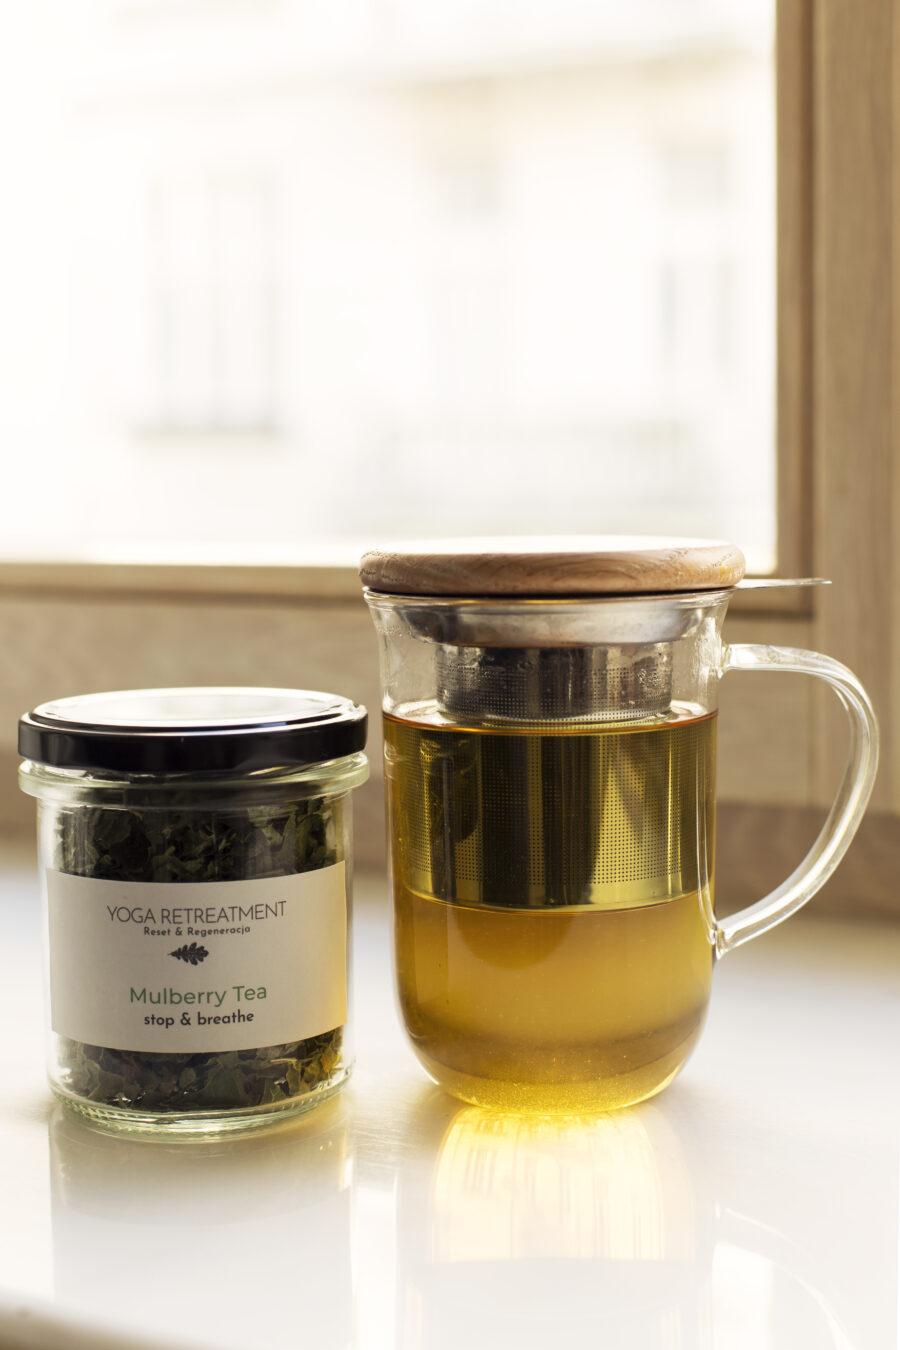 ZESTAW YOGA RETREATMENT LEMONGRASS TEA & MULBERRY TEA